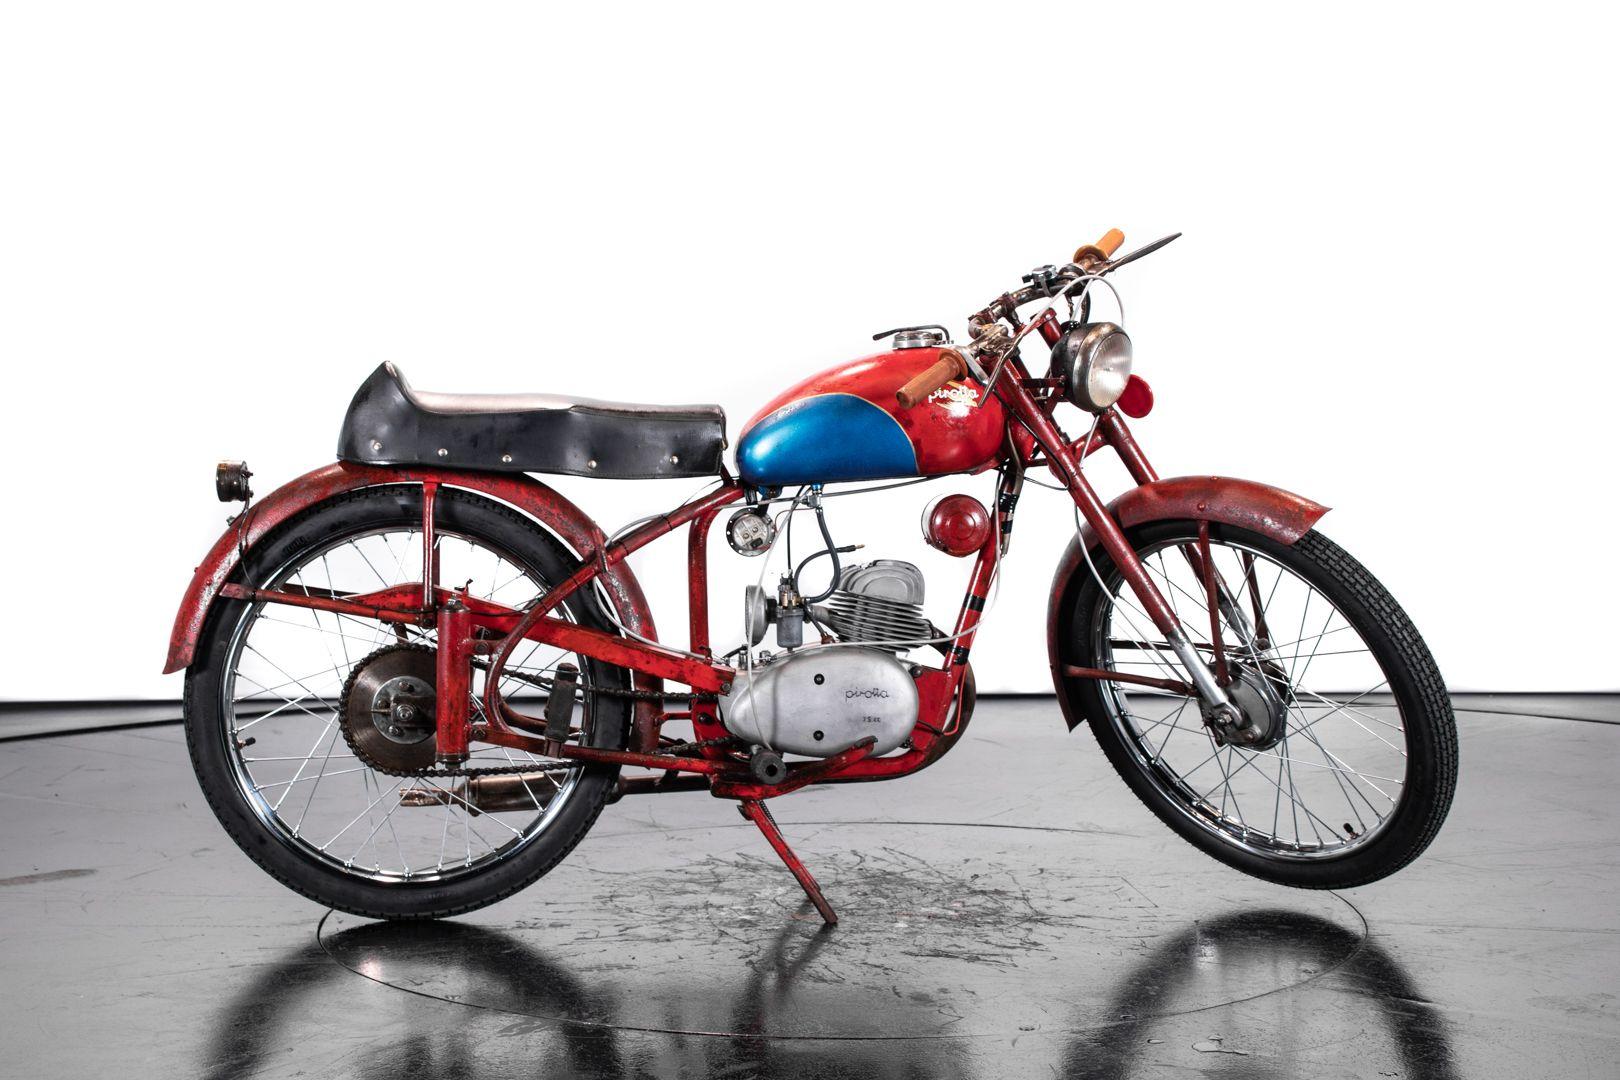 1954 Pirotta 75cc 85023